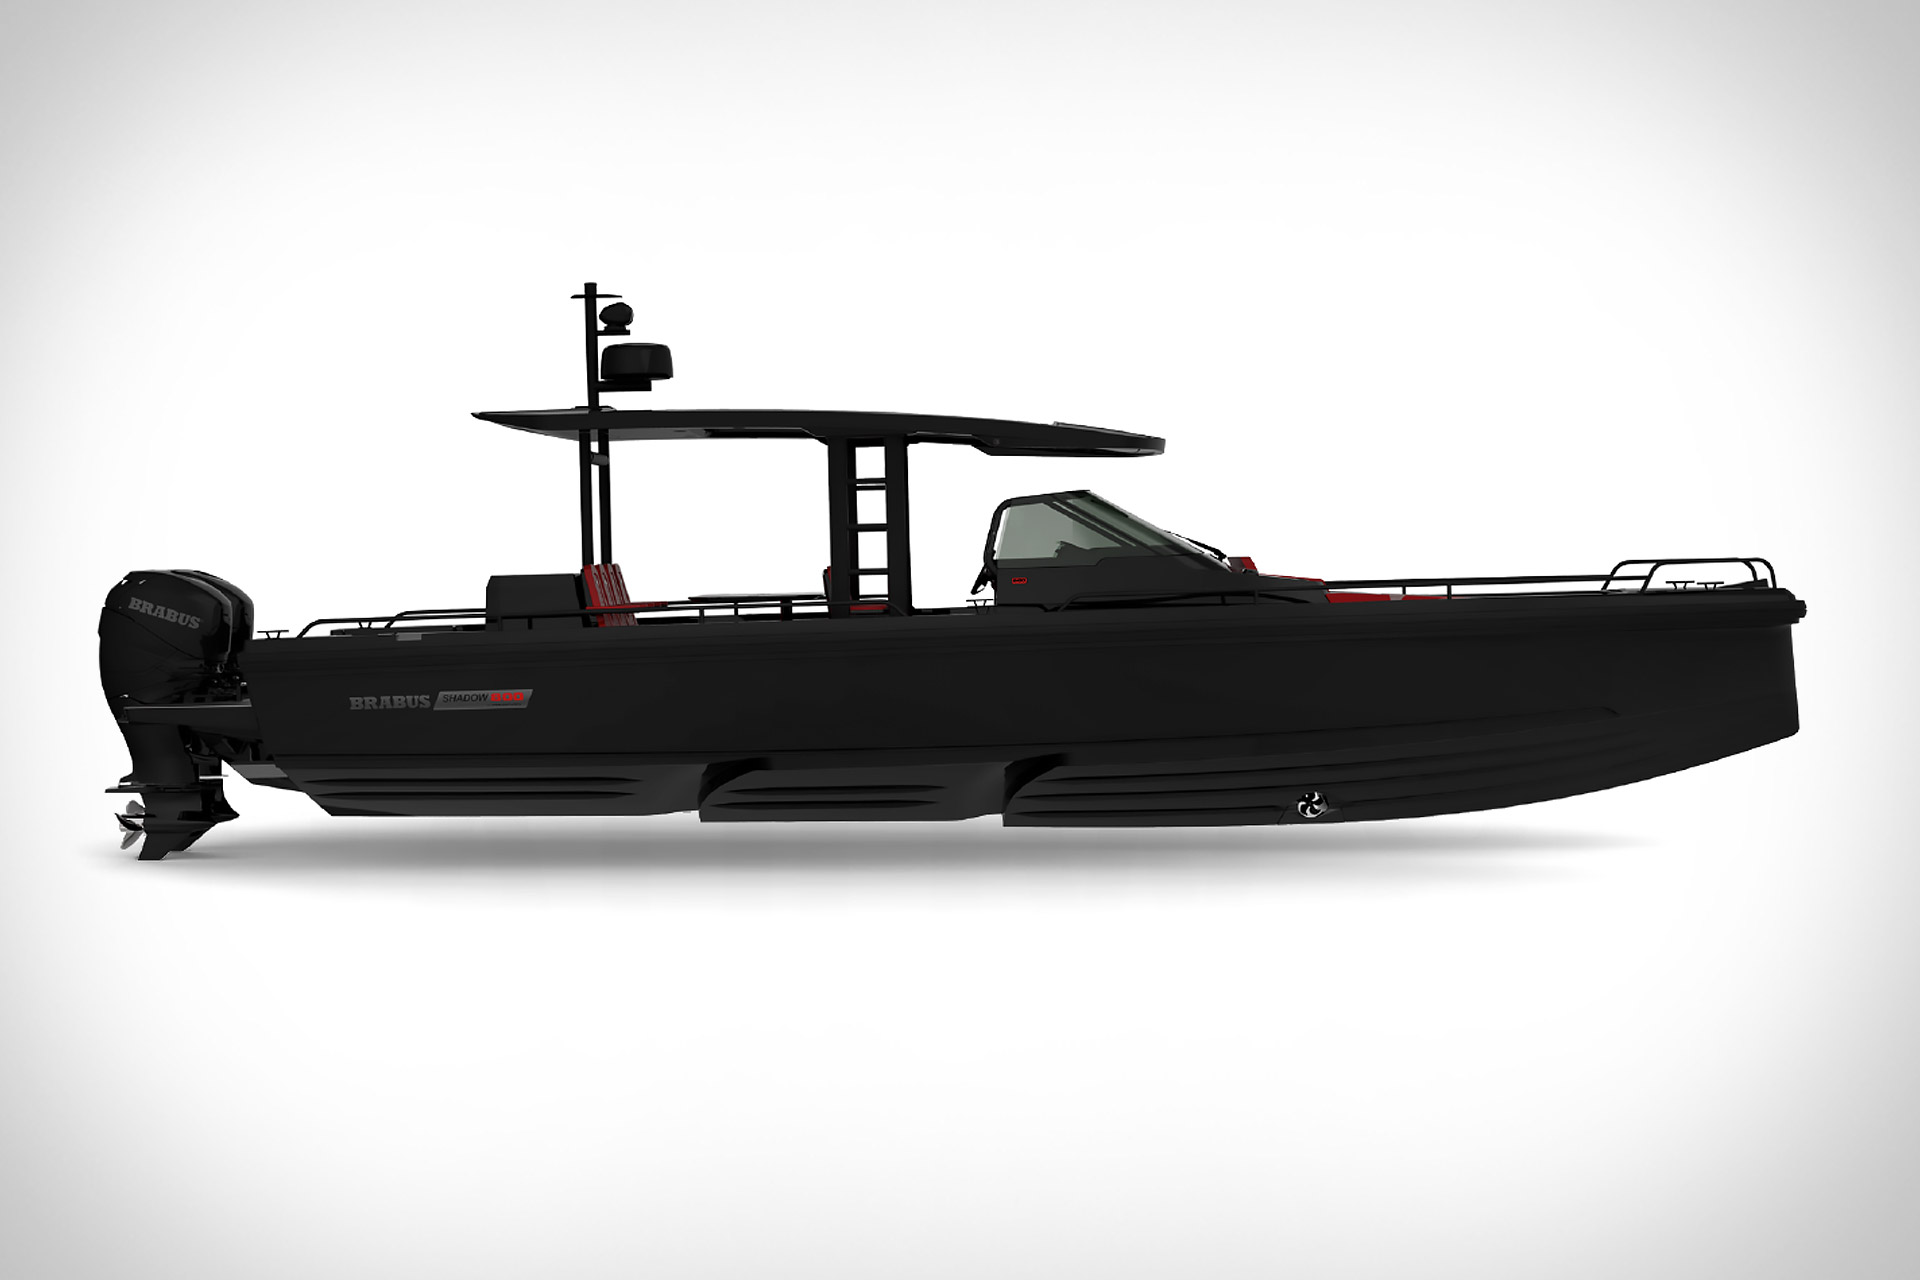 Brabus Shadow 800 Boat